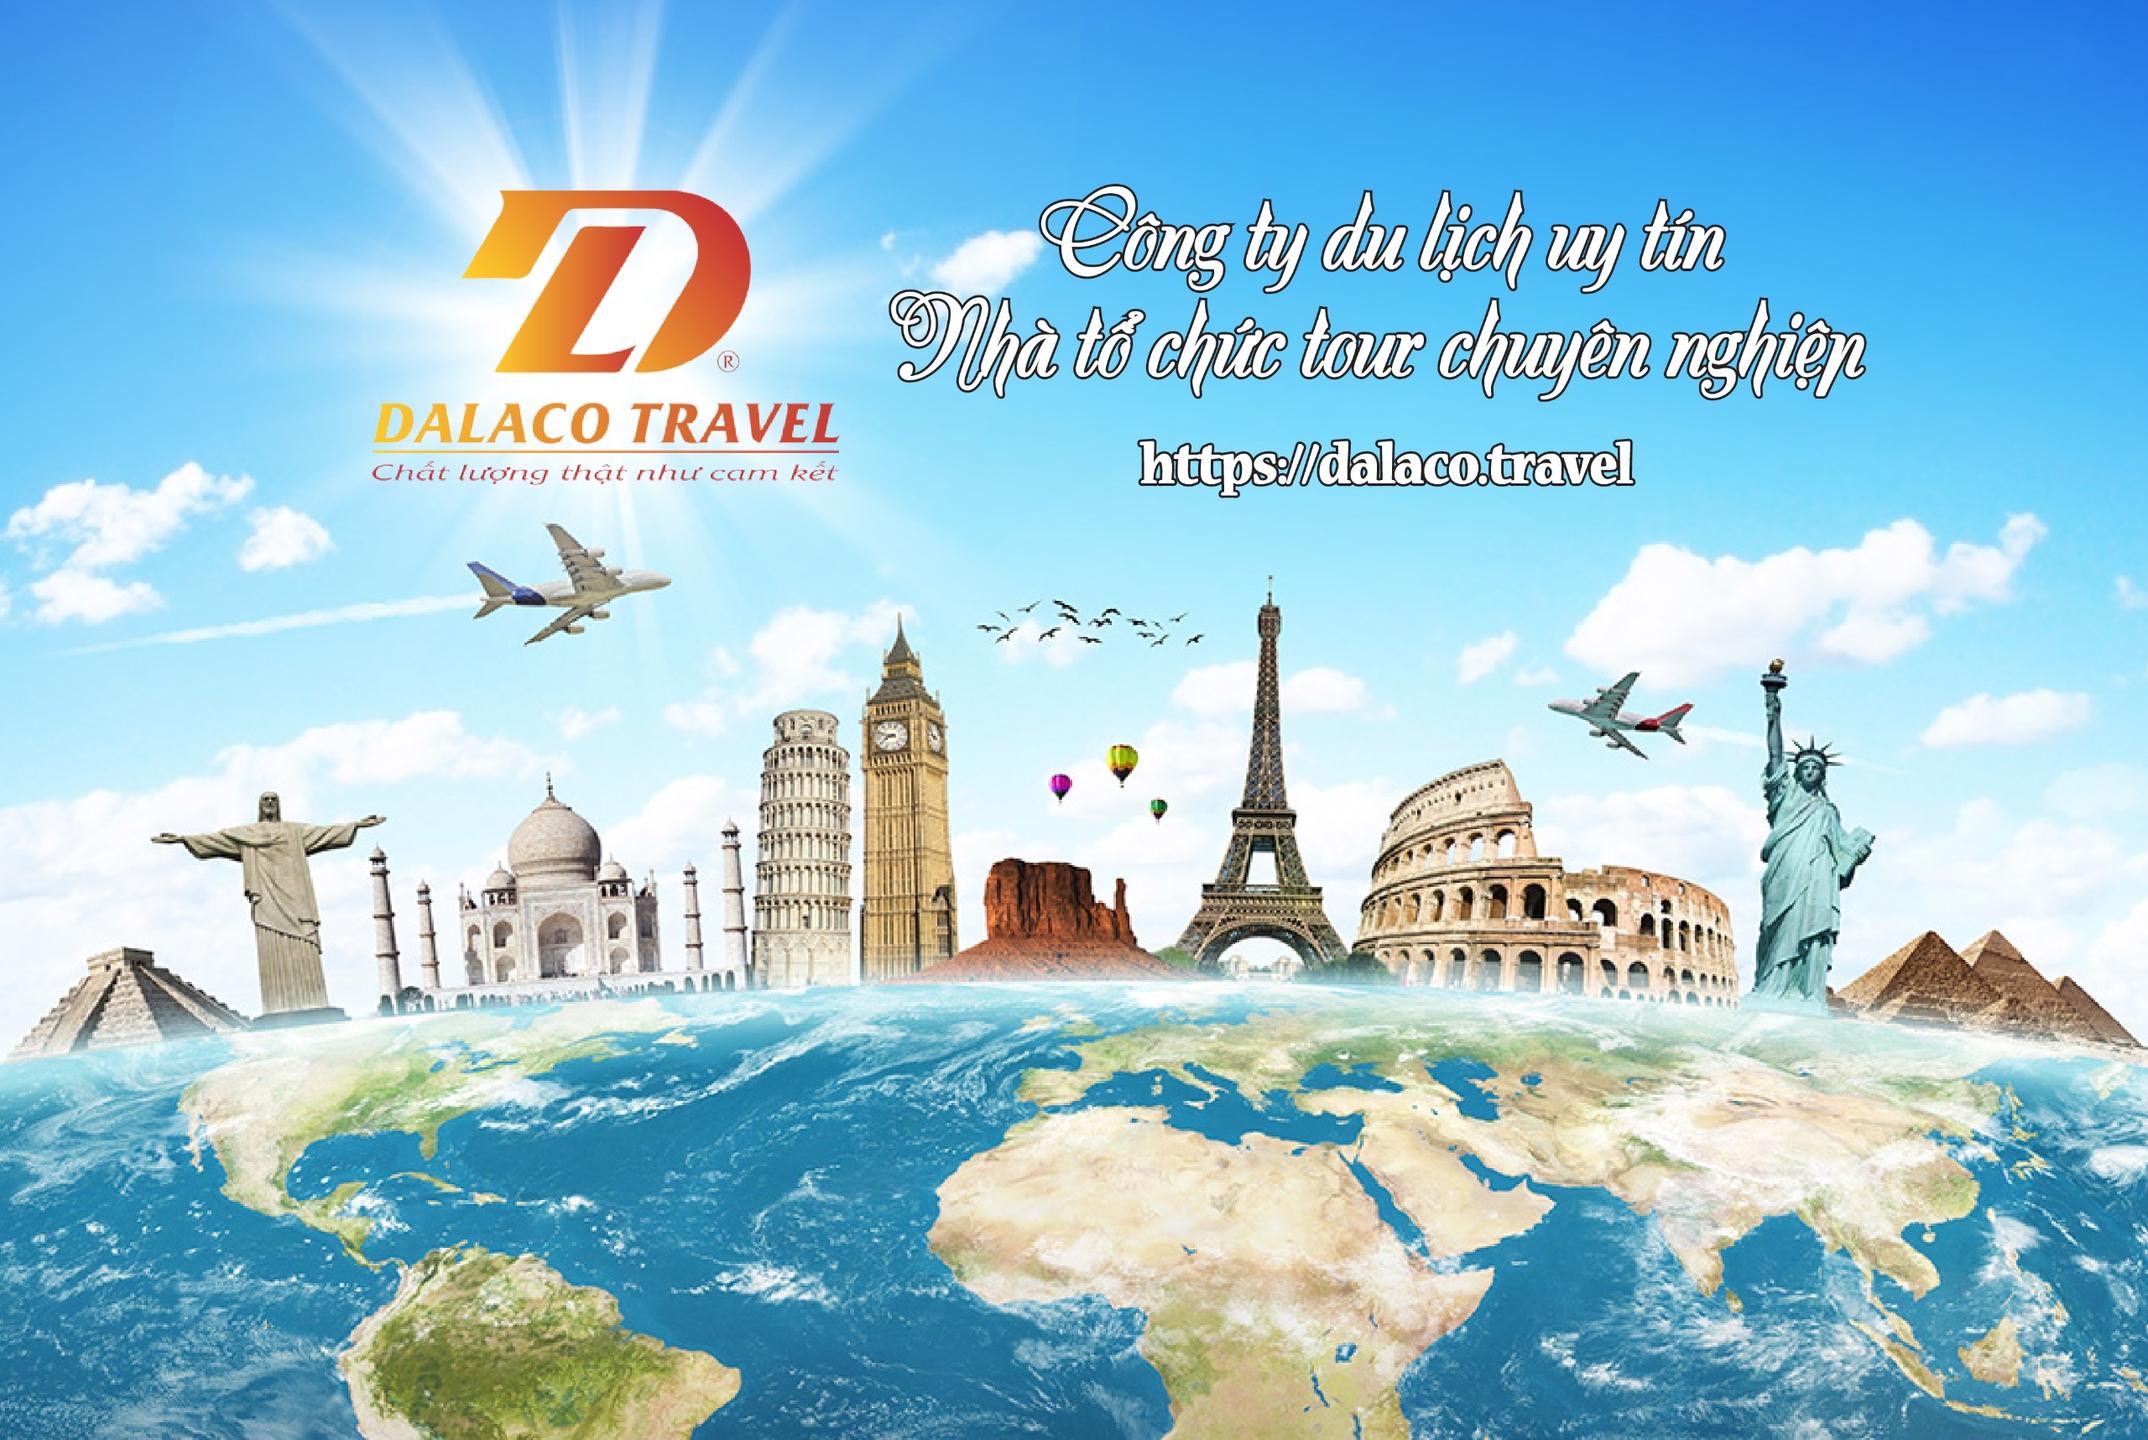 DALACO TRAVEL (@dalaco) Cover Image